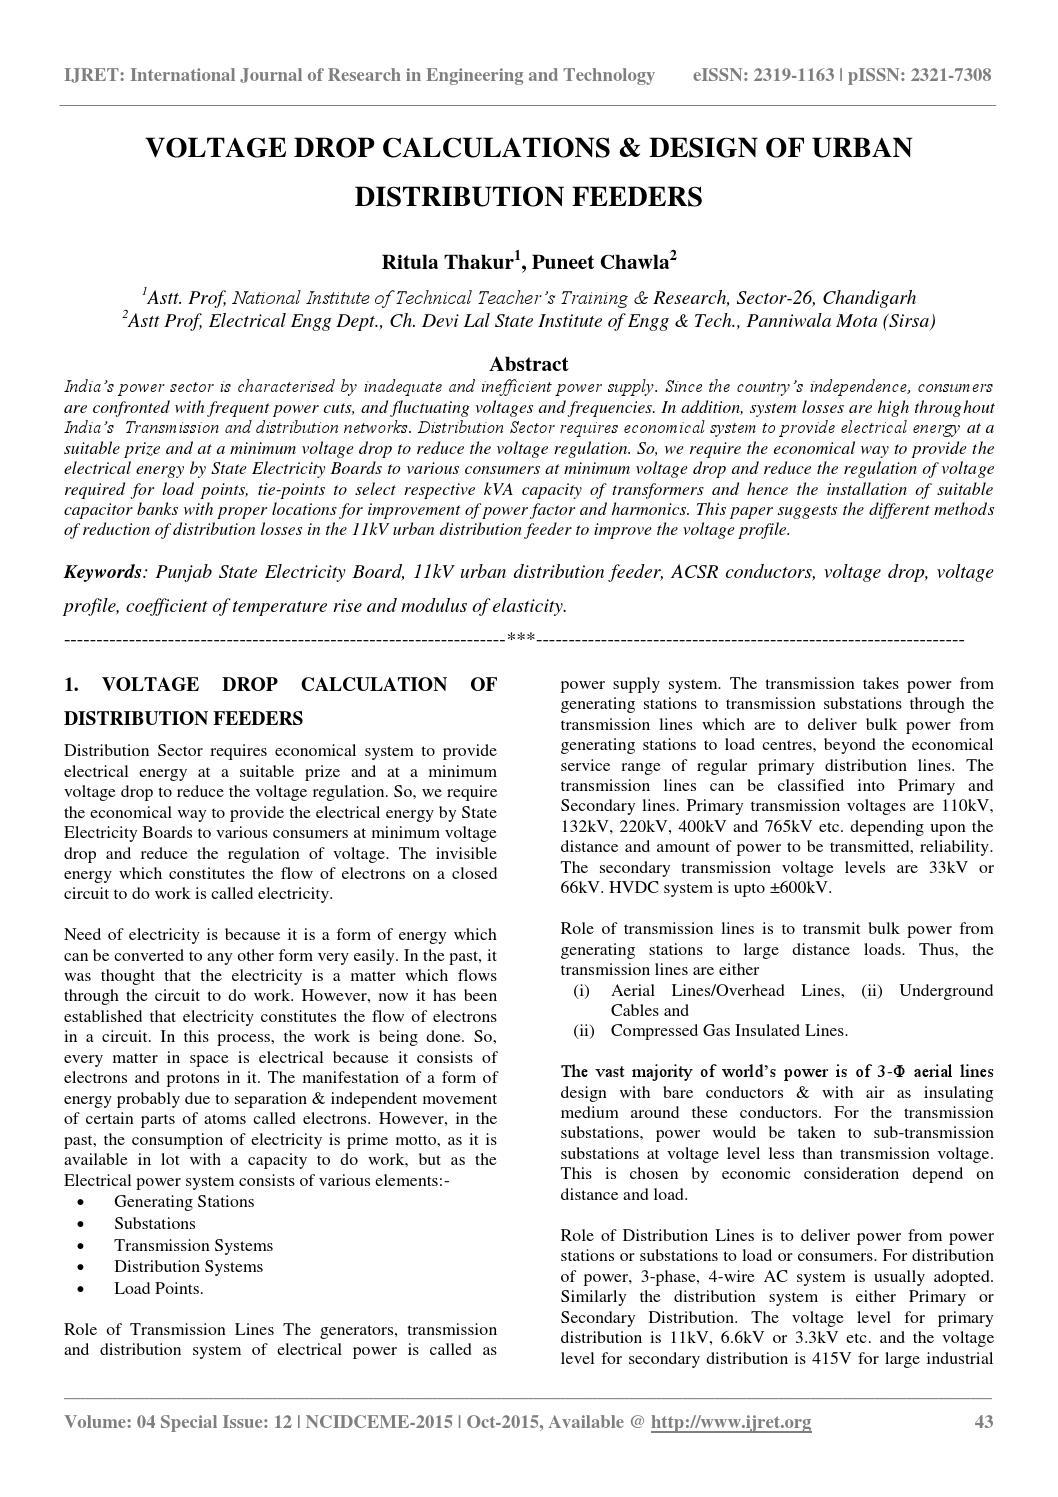 Voltage drop calculations & design of urban distribution